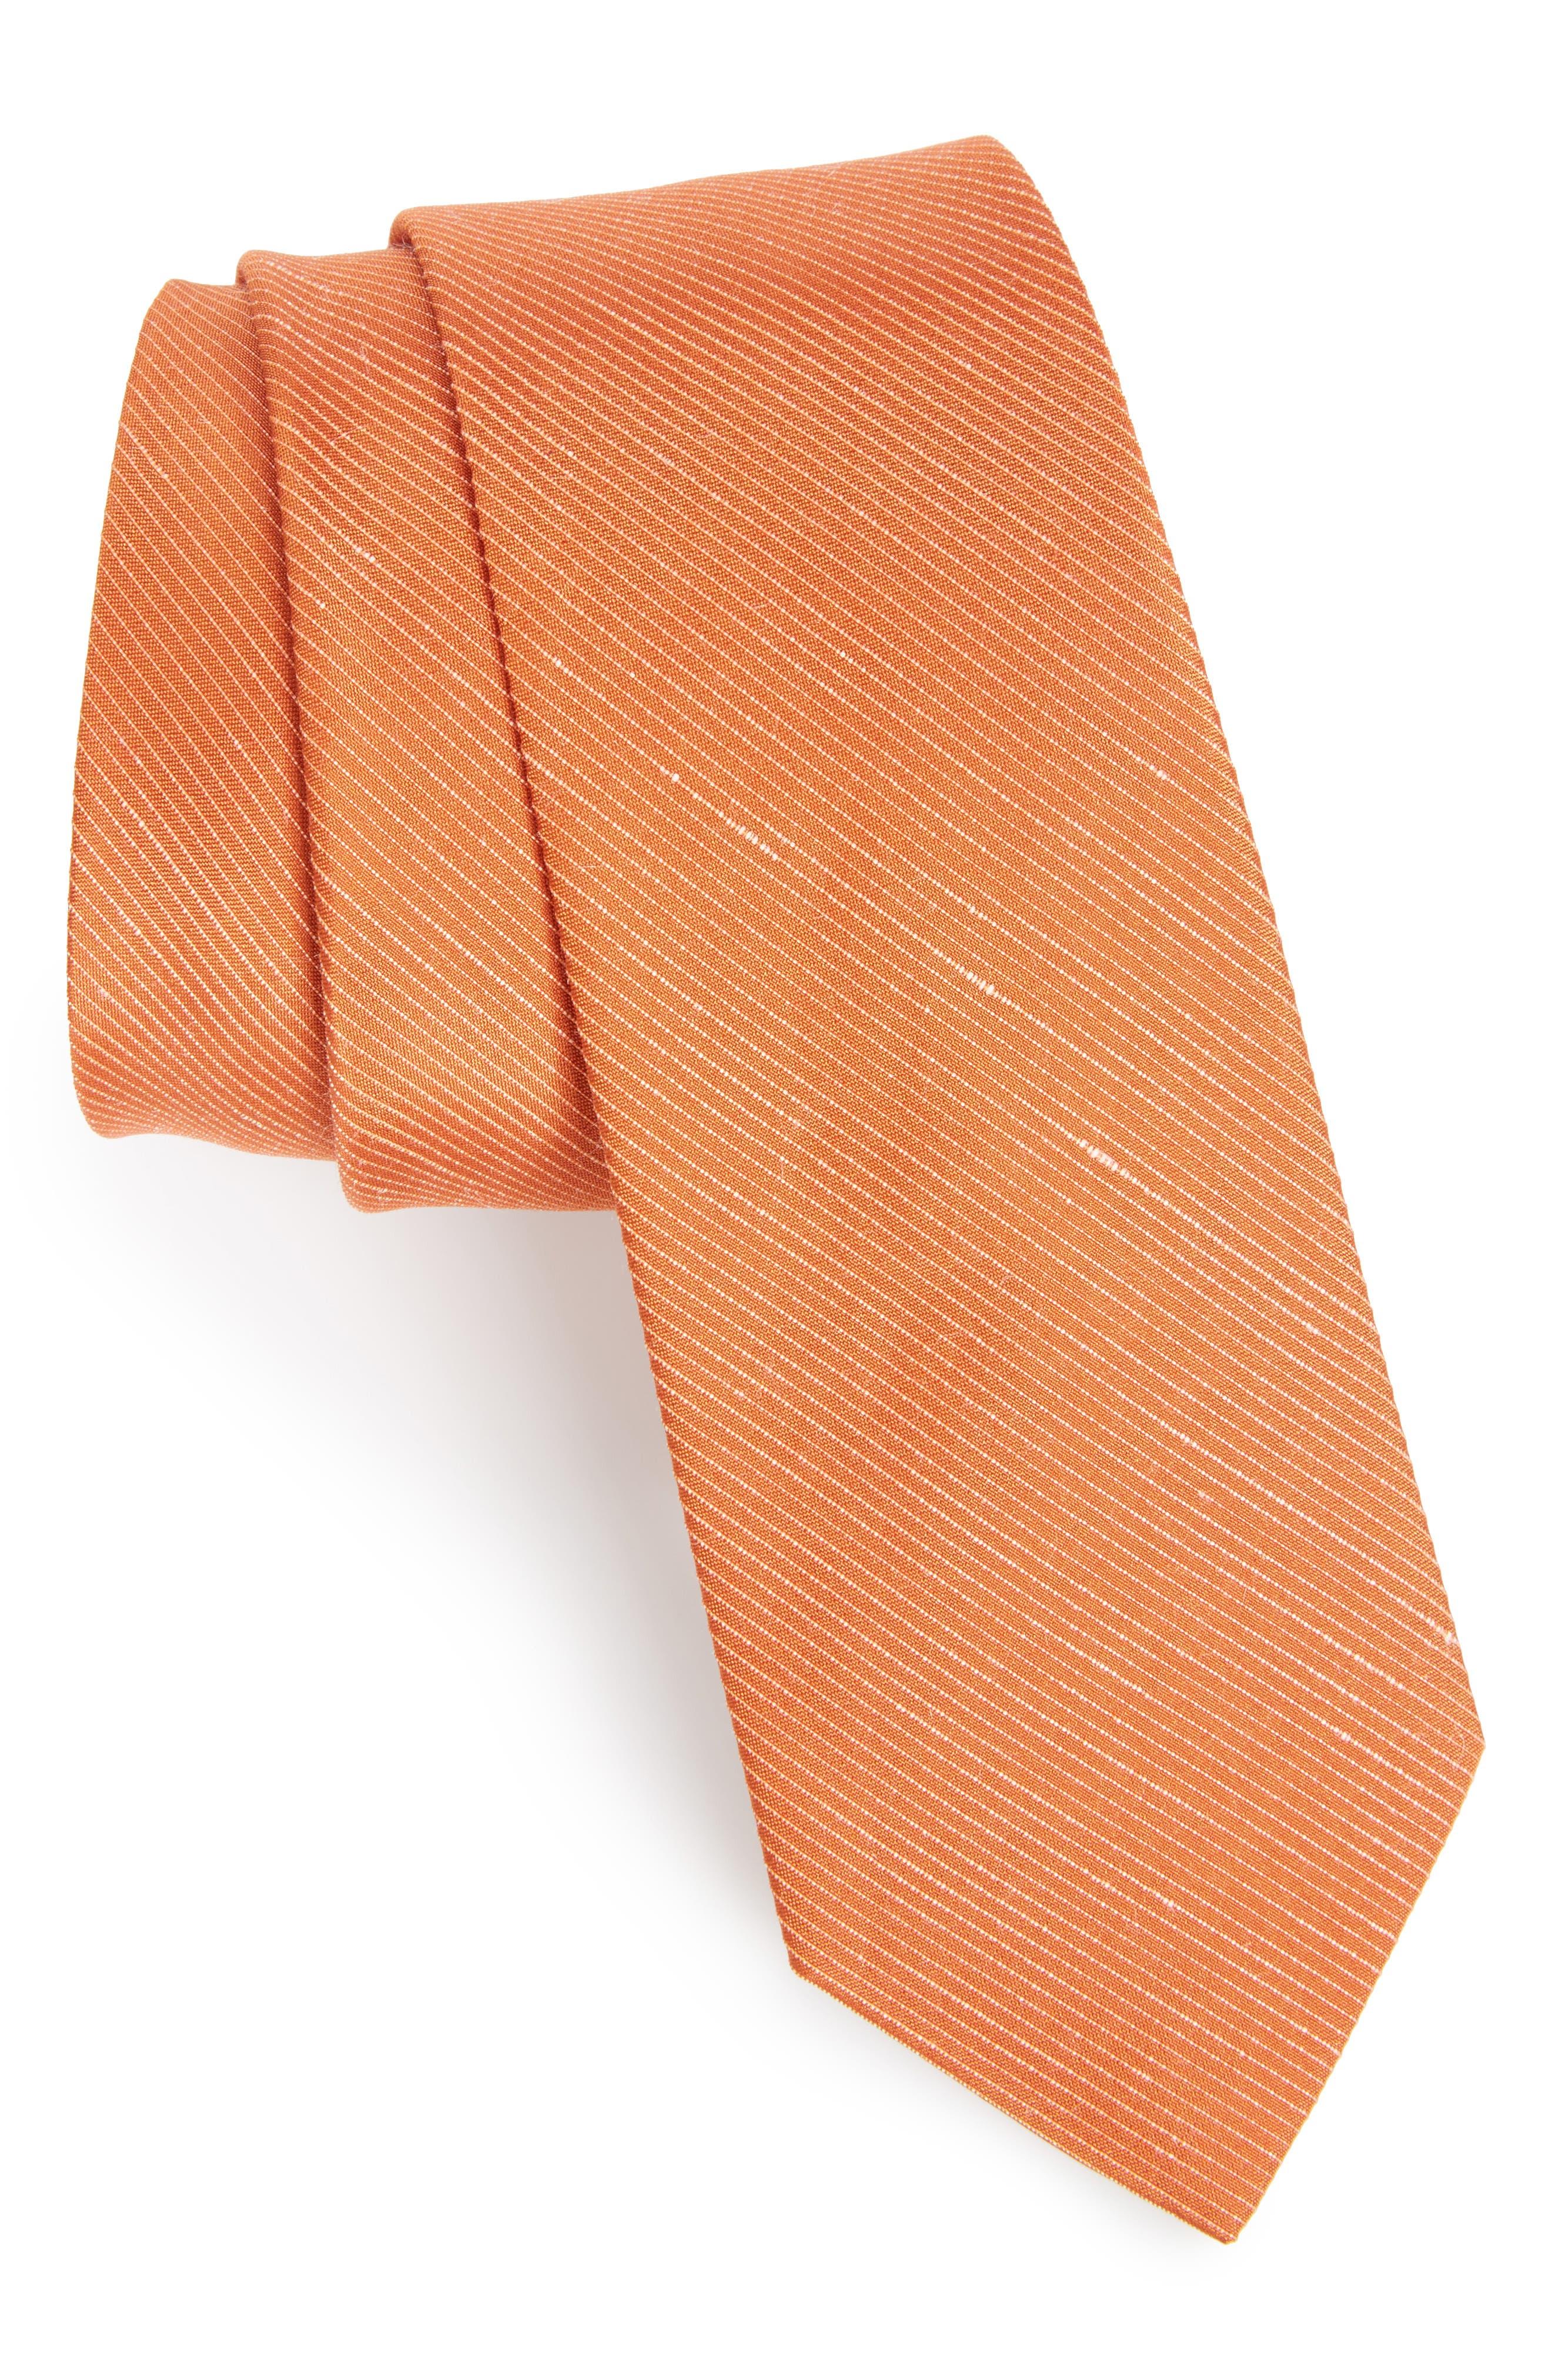 Main Image - The Tie Bar Pinstripe Silk & Linen Tie